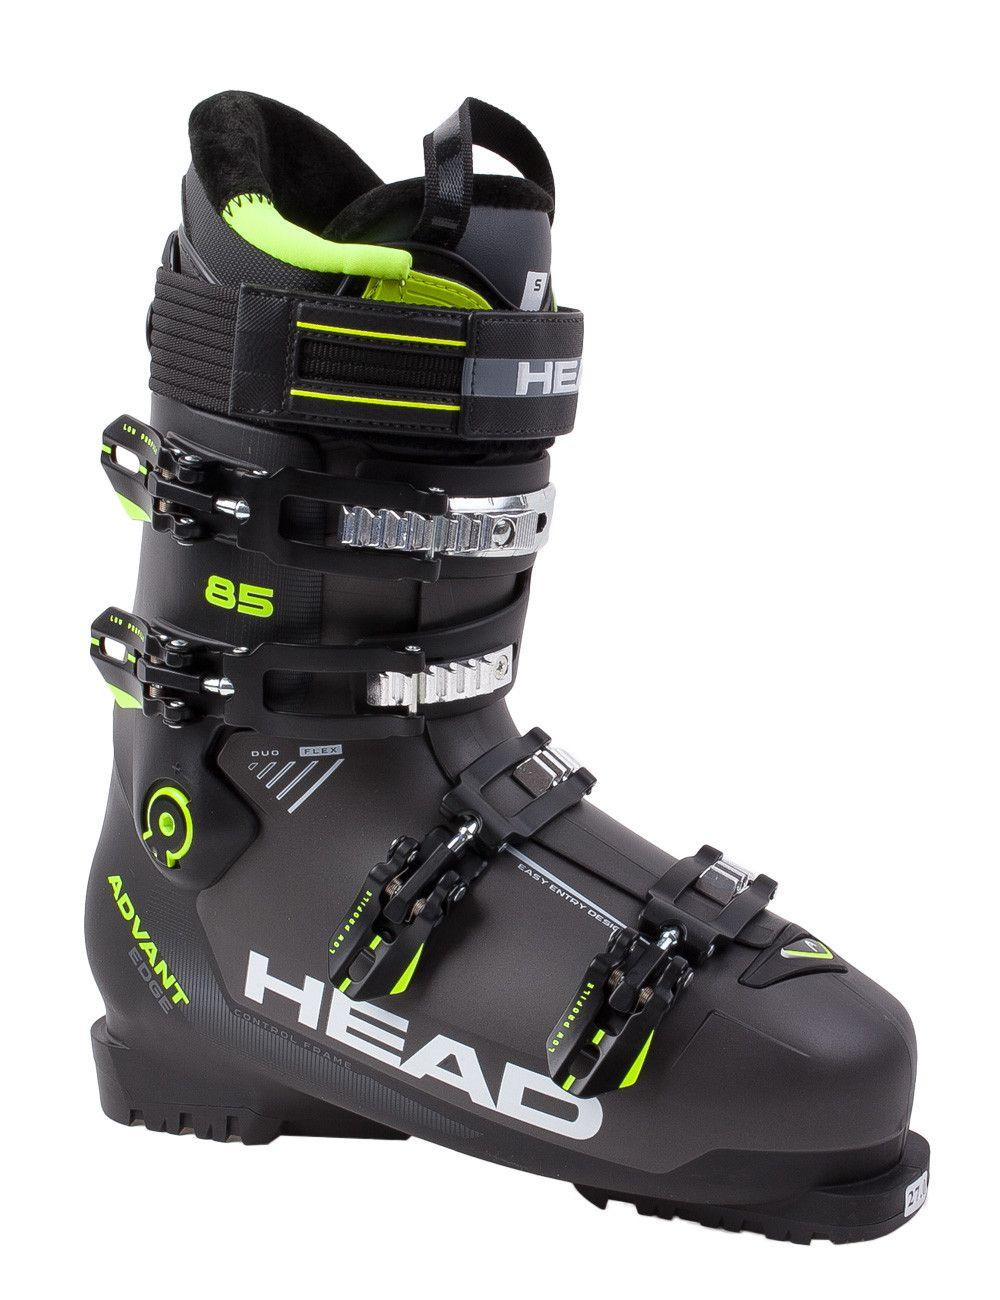 Buty narciarskie Head Advant Edge 85